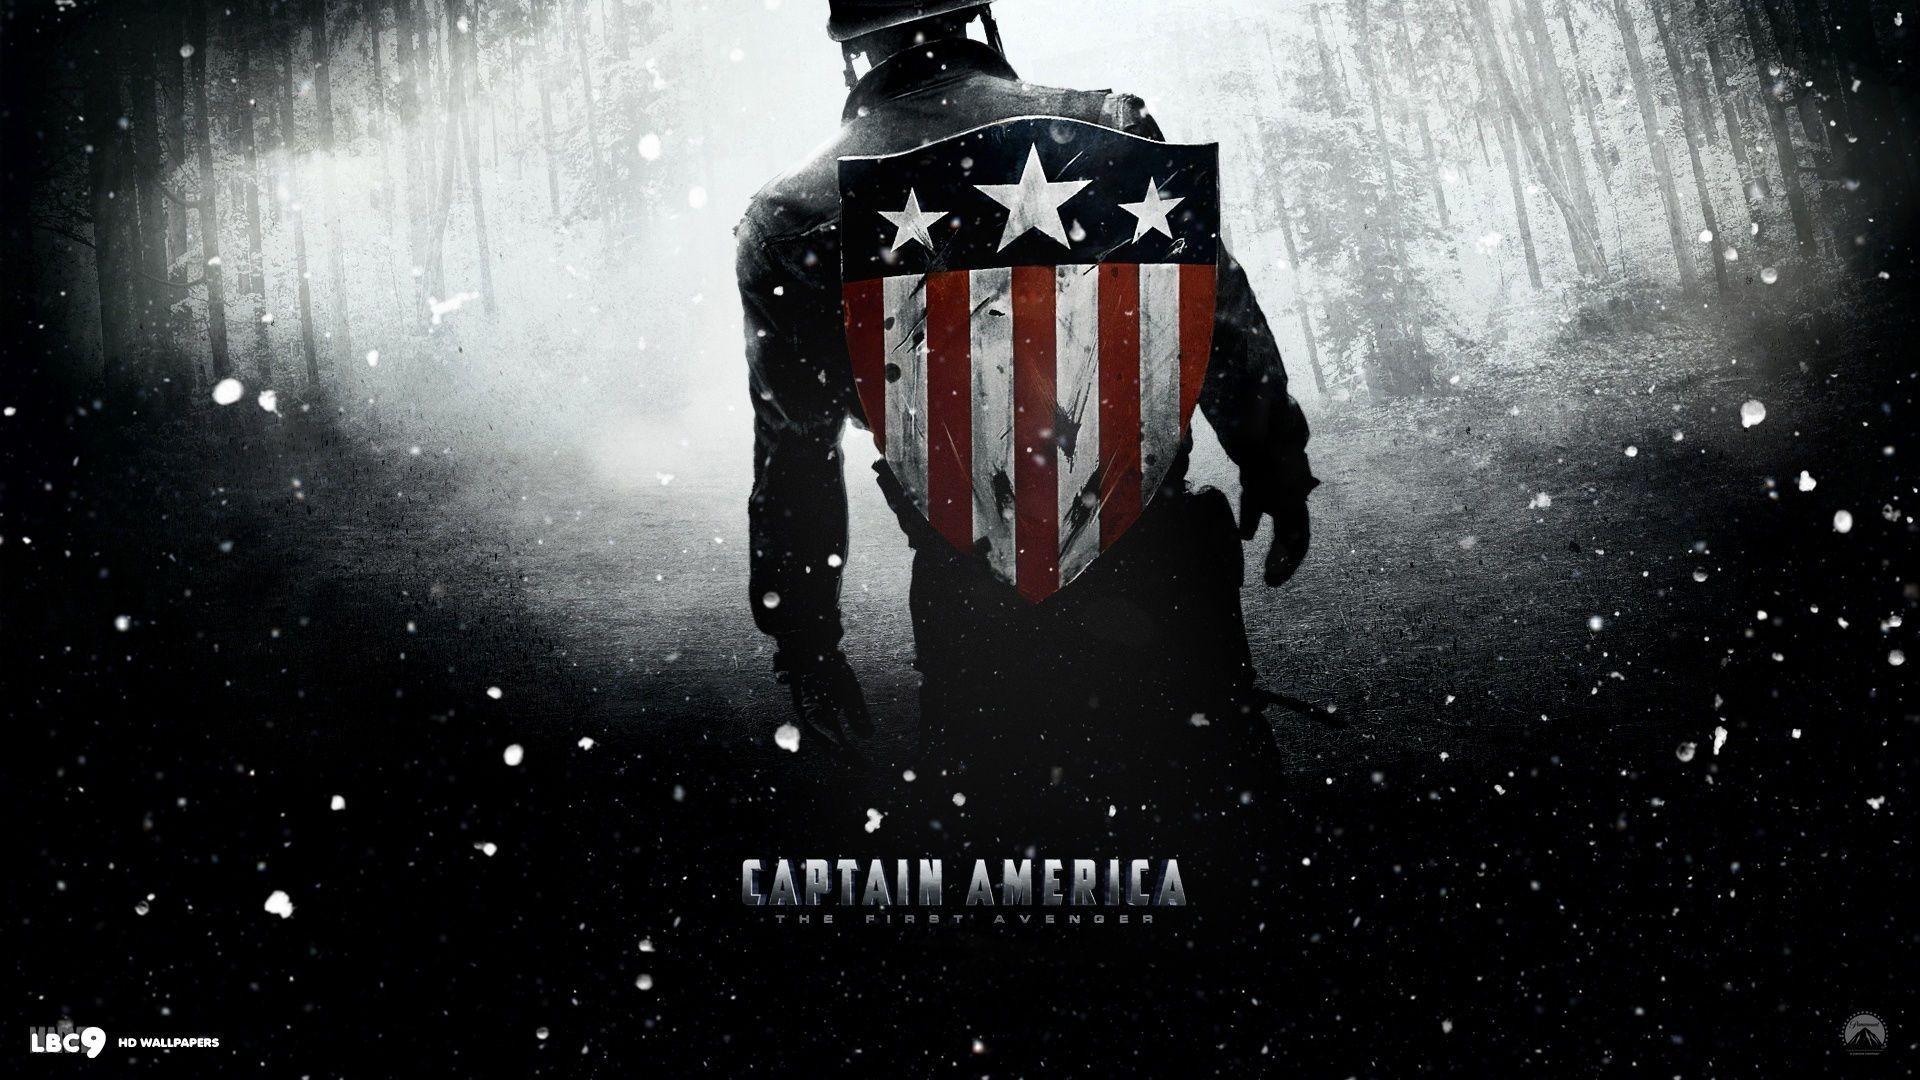 Wallpaper Hd Captain America The First Avenger – 1530981